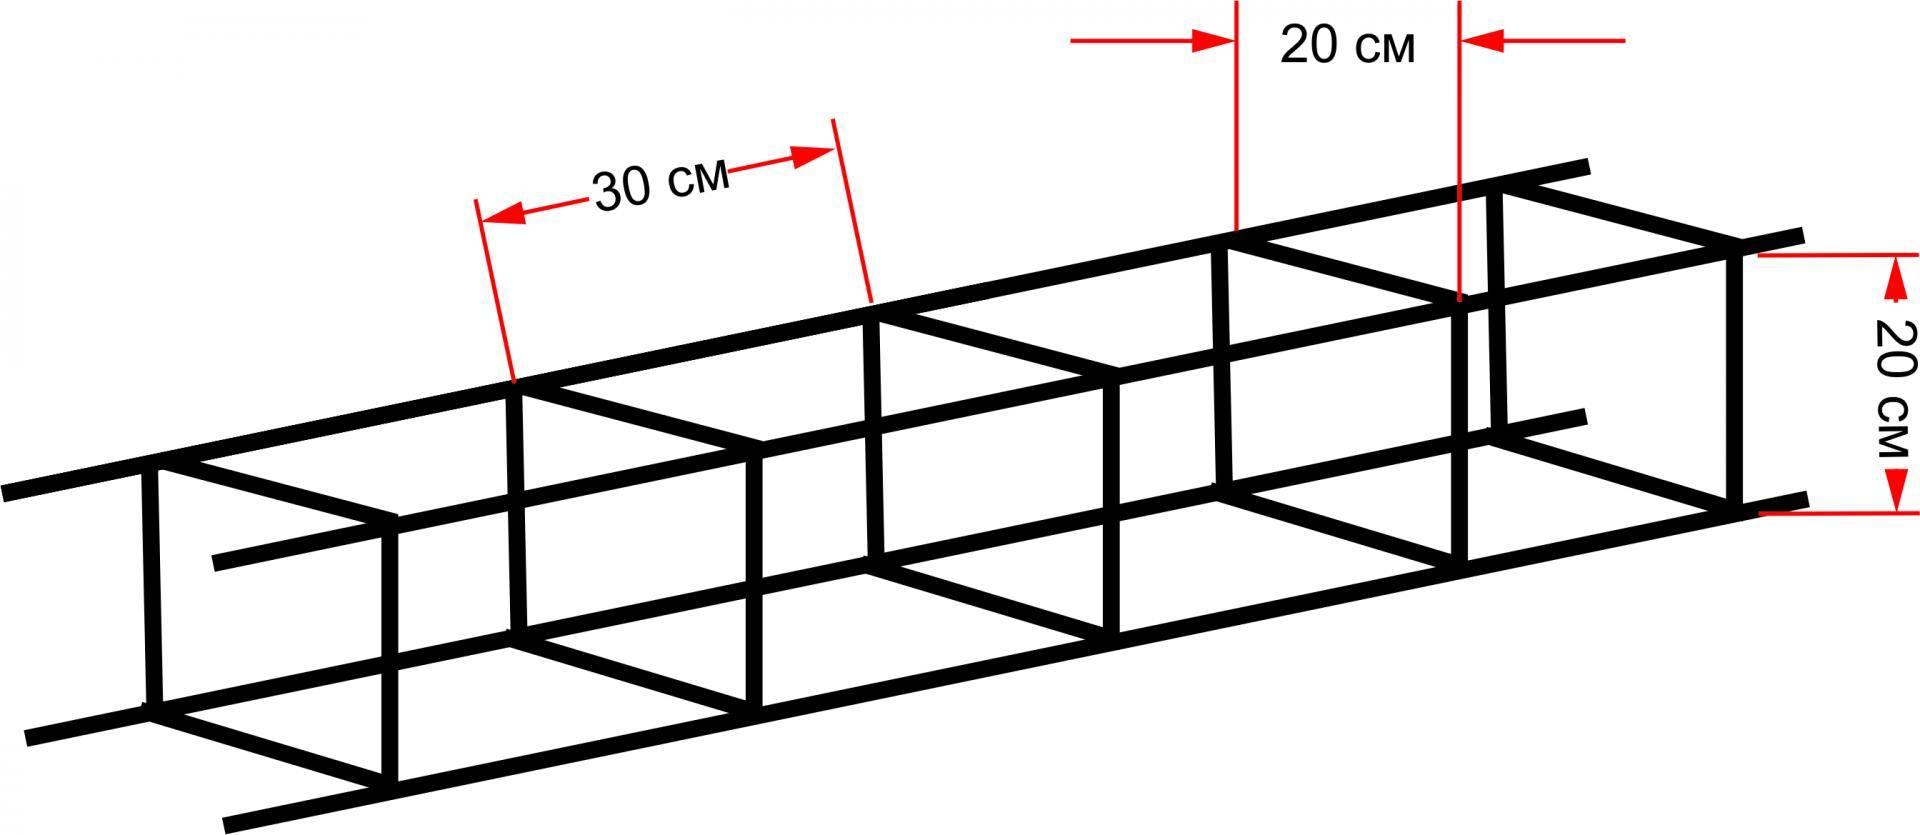 Как сделать каркас из арматуры для фундамента